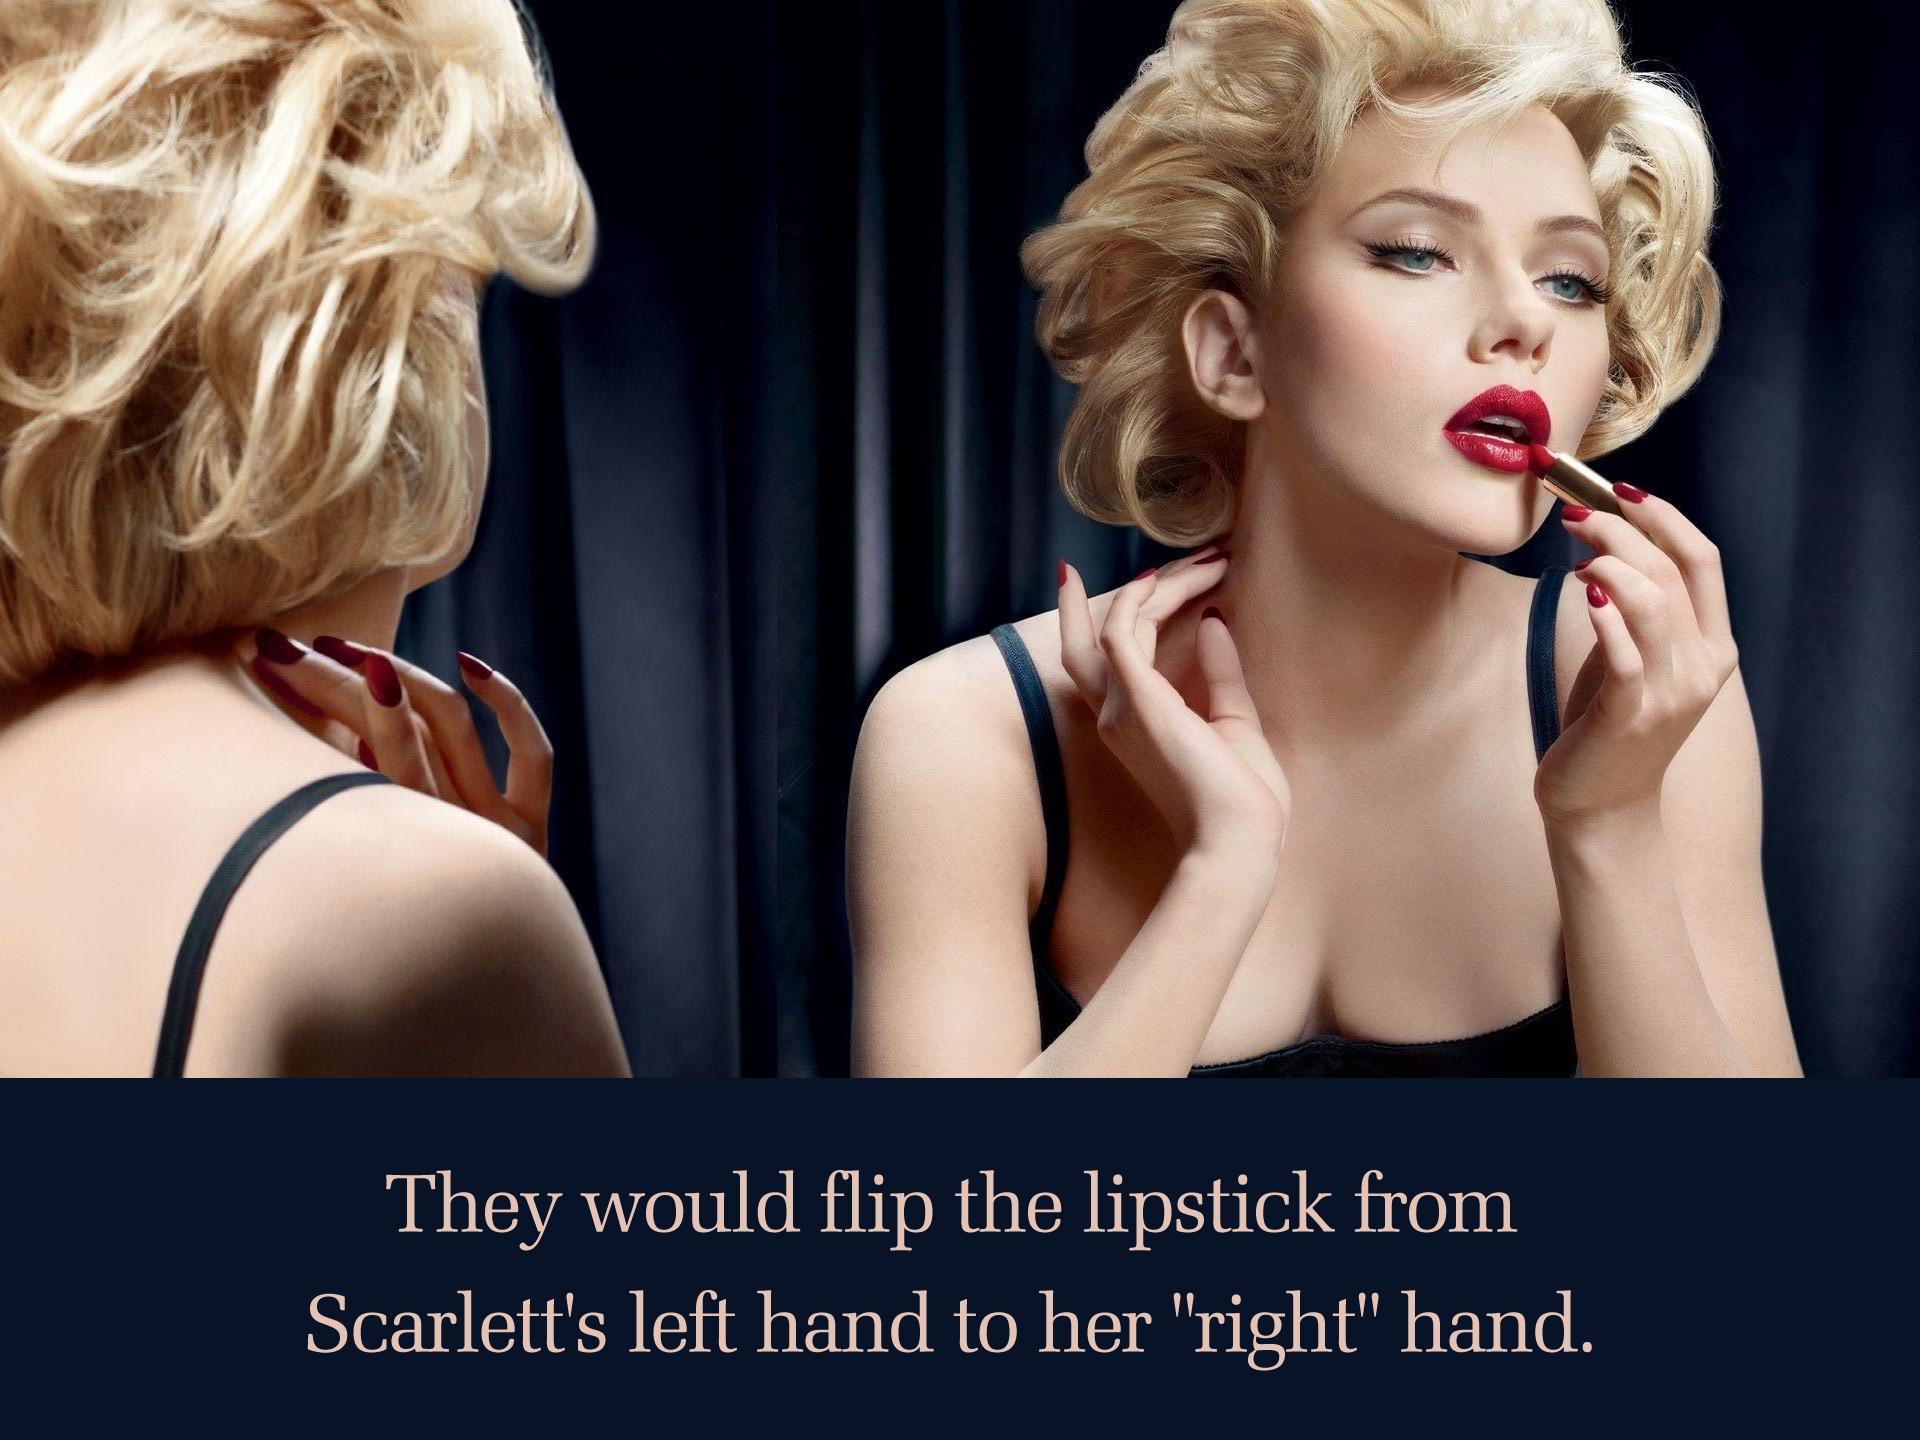 Scarlett Mirror Flipped Lipstick